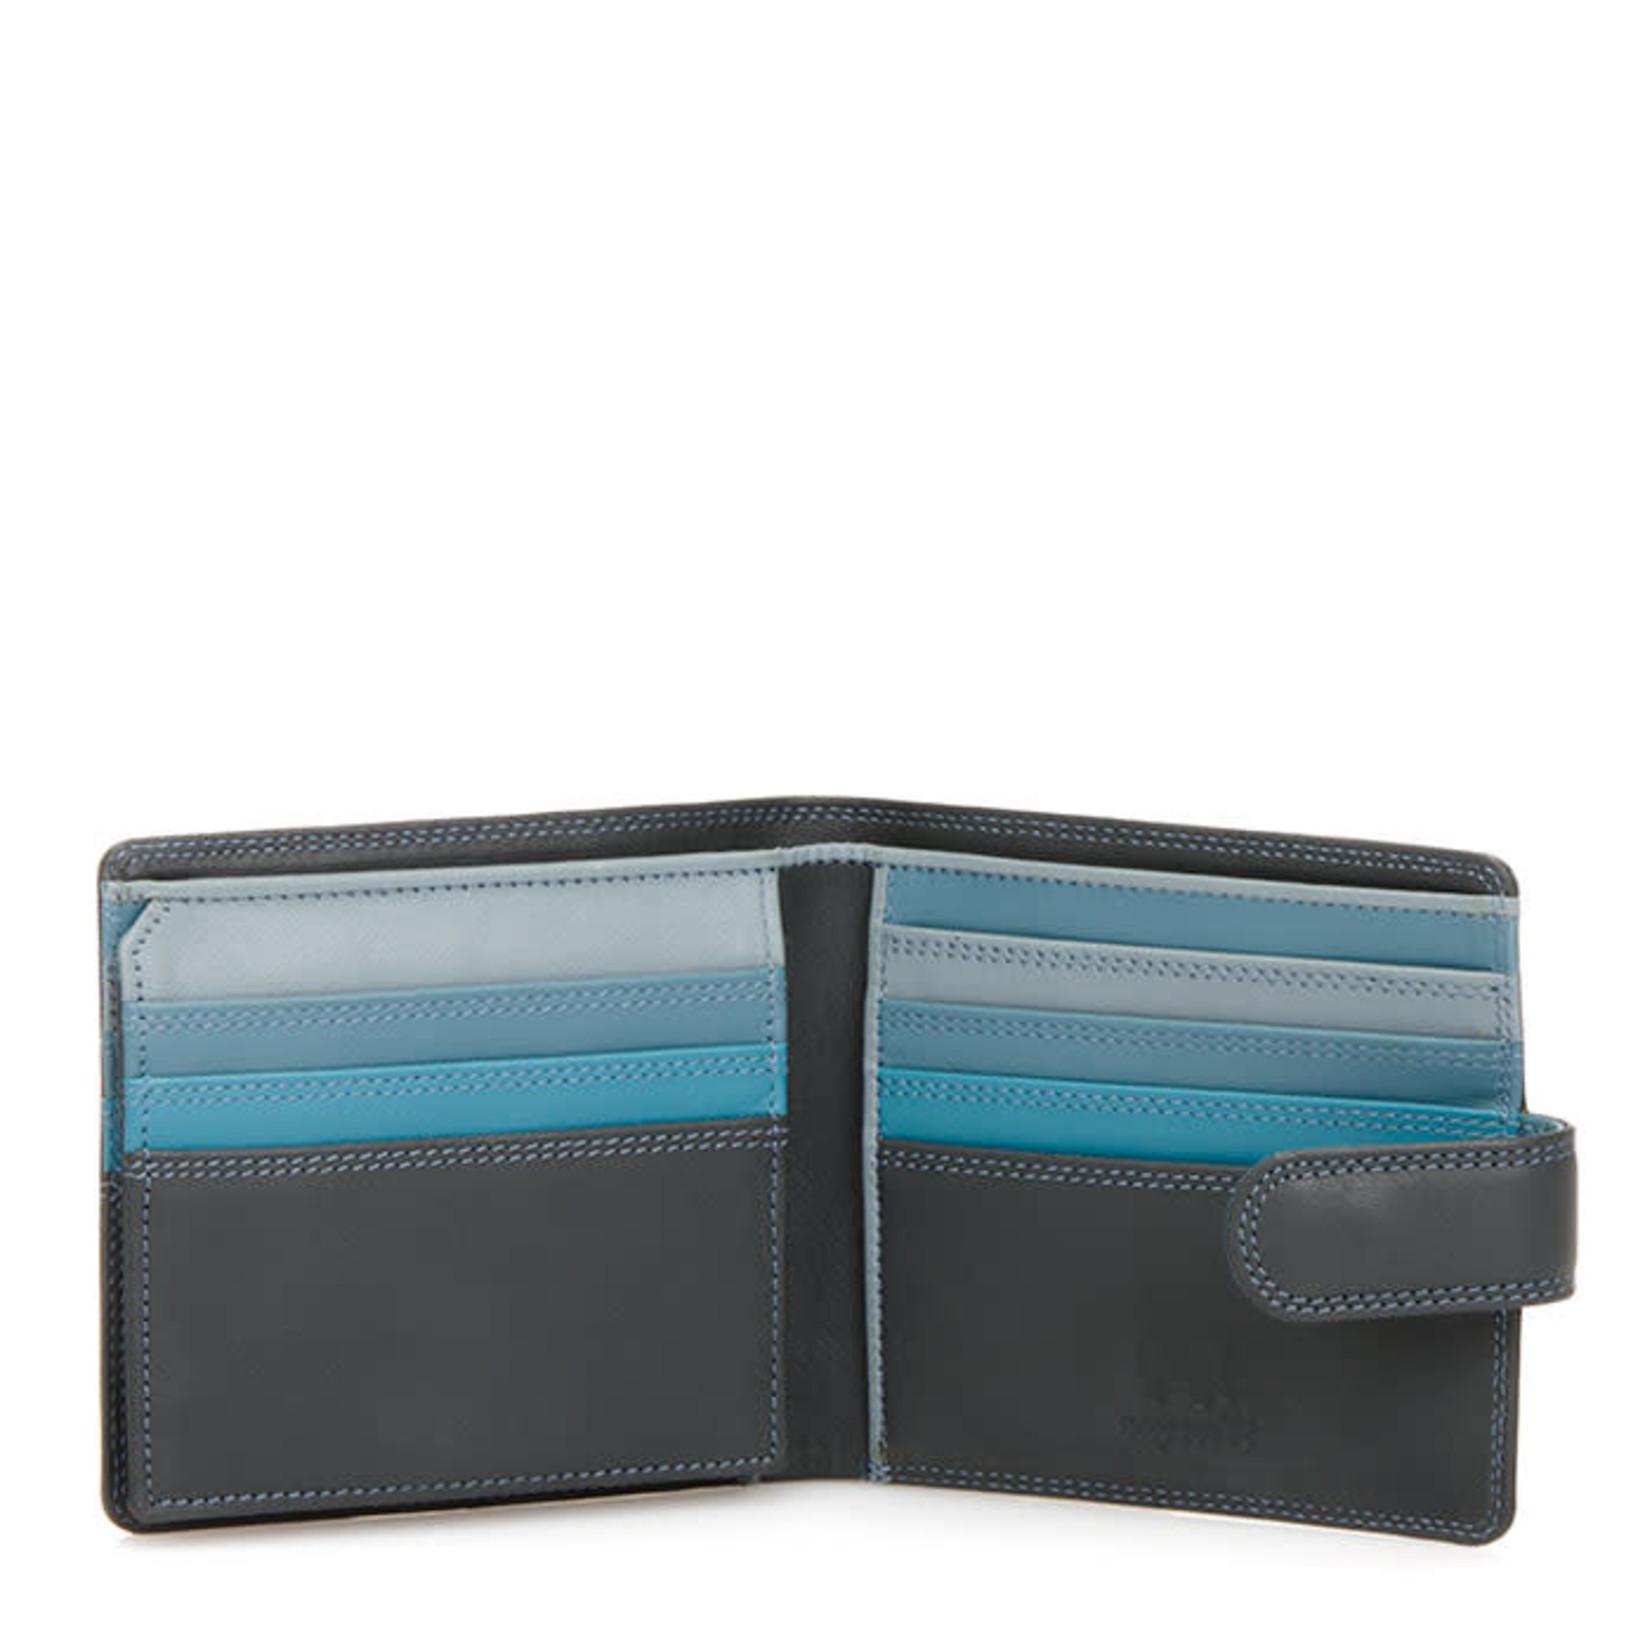 MyWalit Tab Wallet With Inner Leaf Smokey Grey